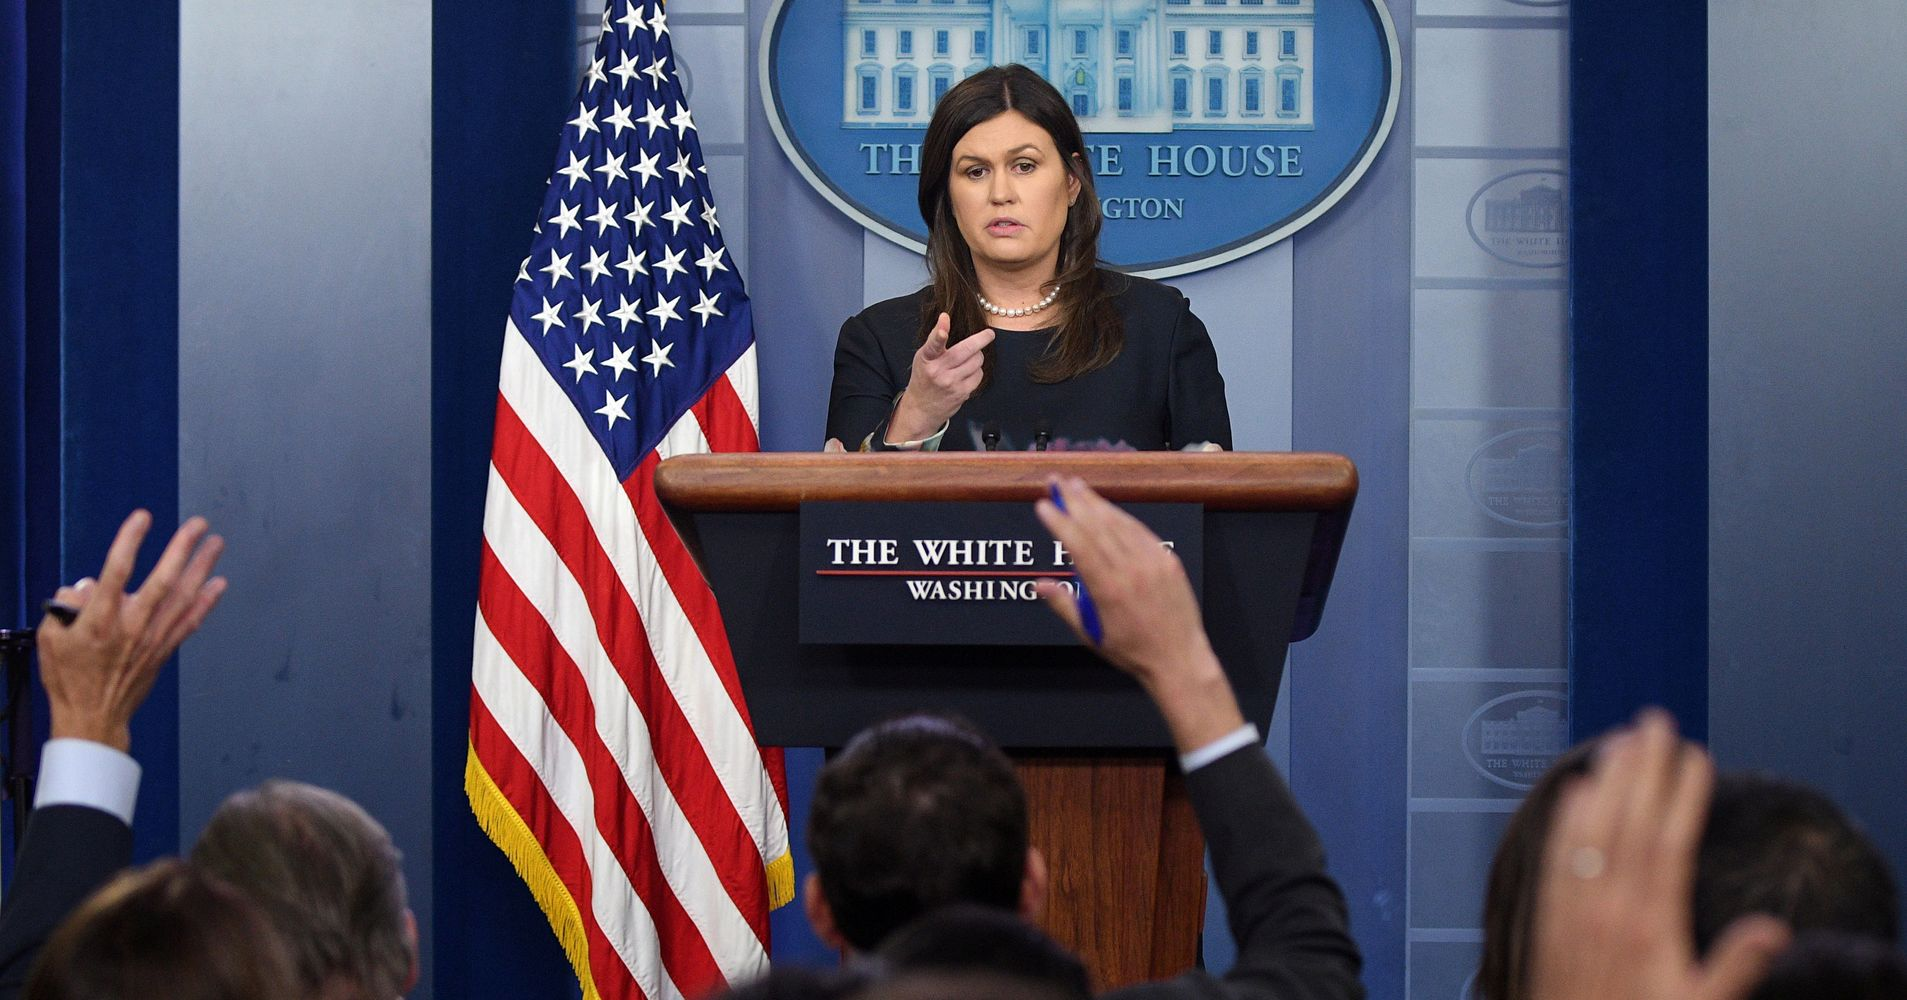 Sarah Huckabee Sanders: 'I Can't Guarantee' Trump Never Said Racial Slur